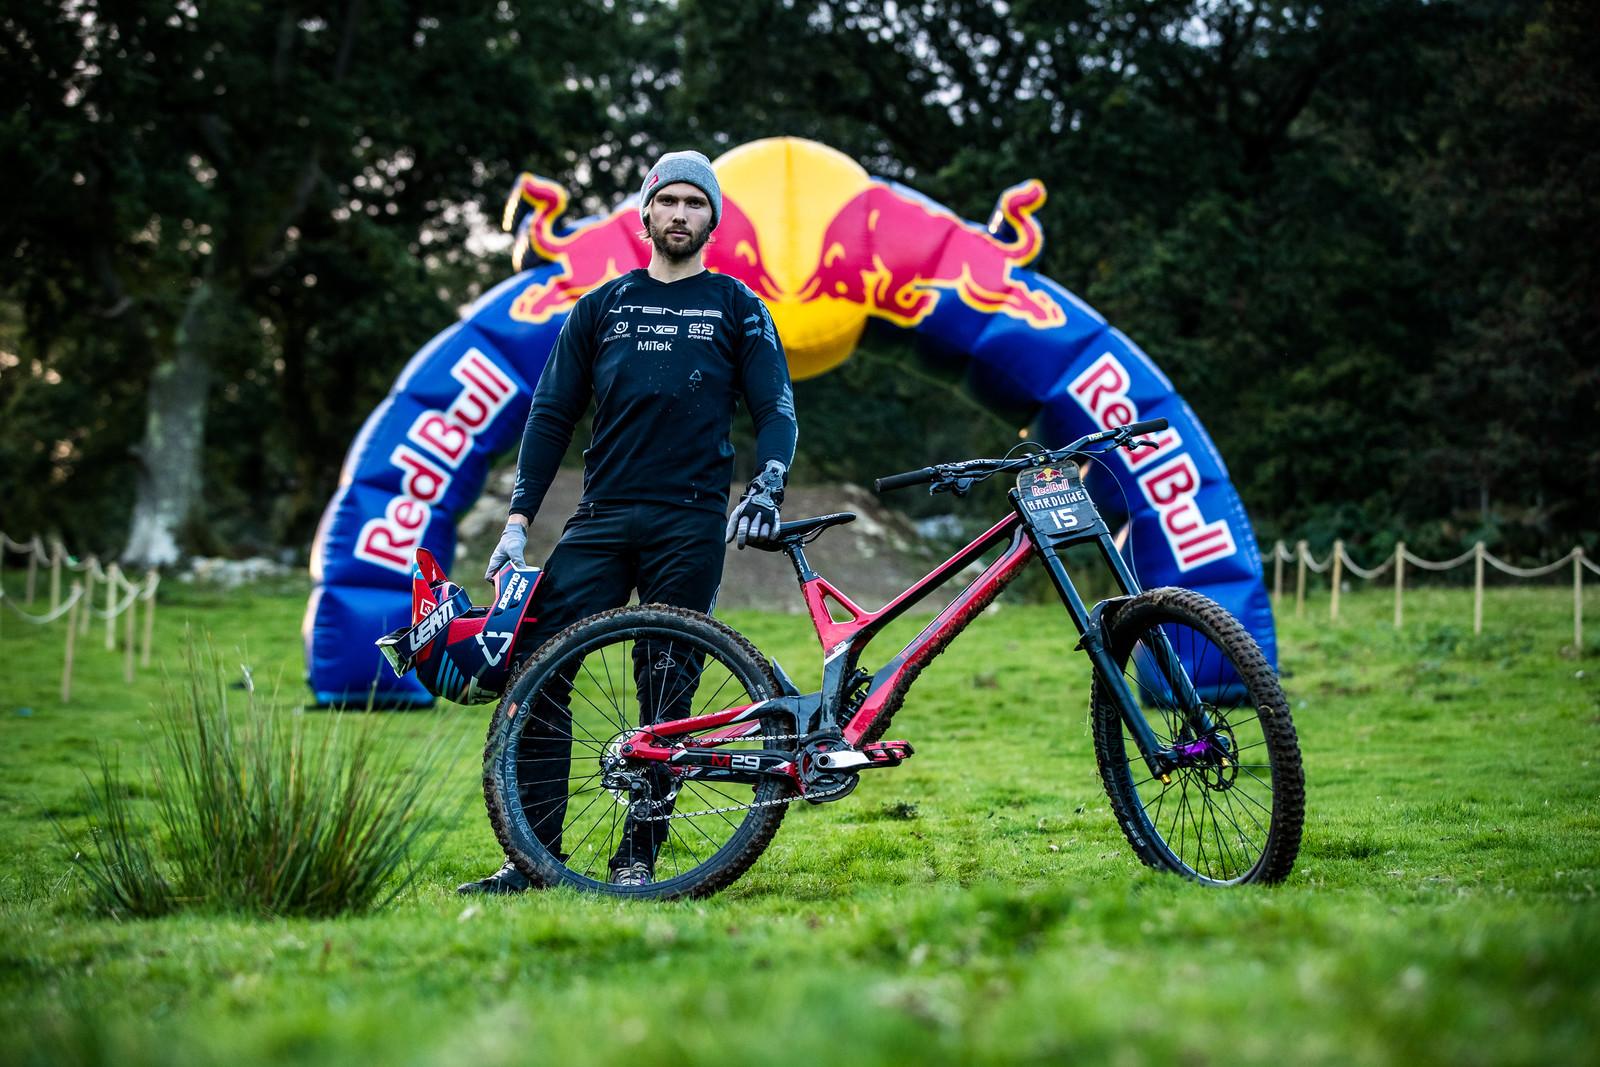 World events: Велосипеды участников Red Bull Hardline